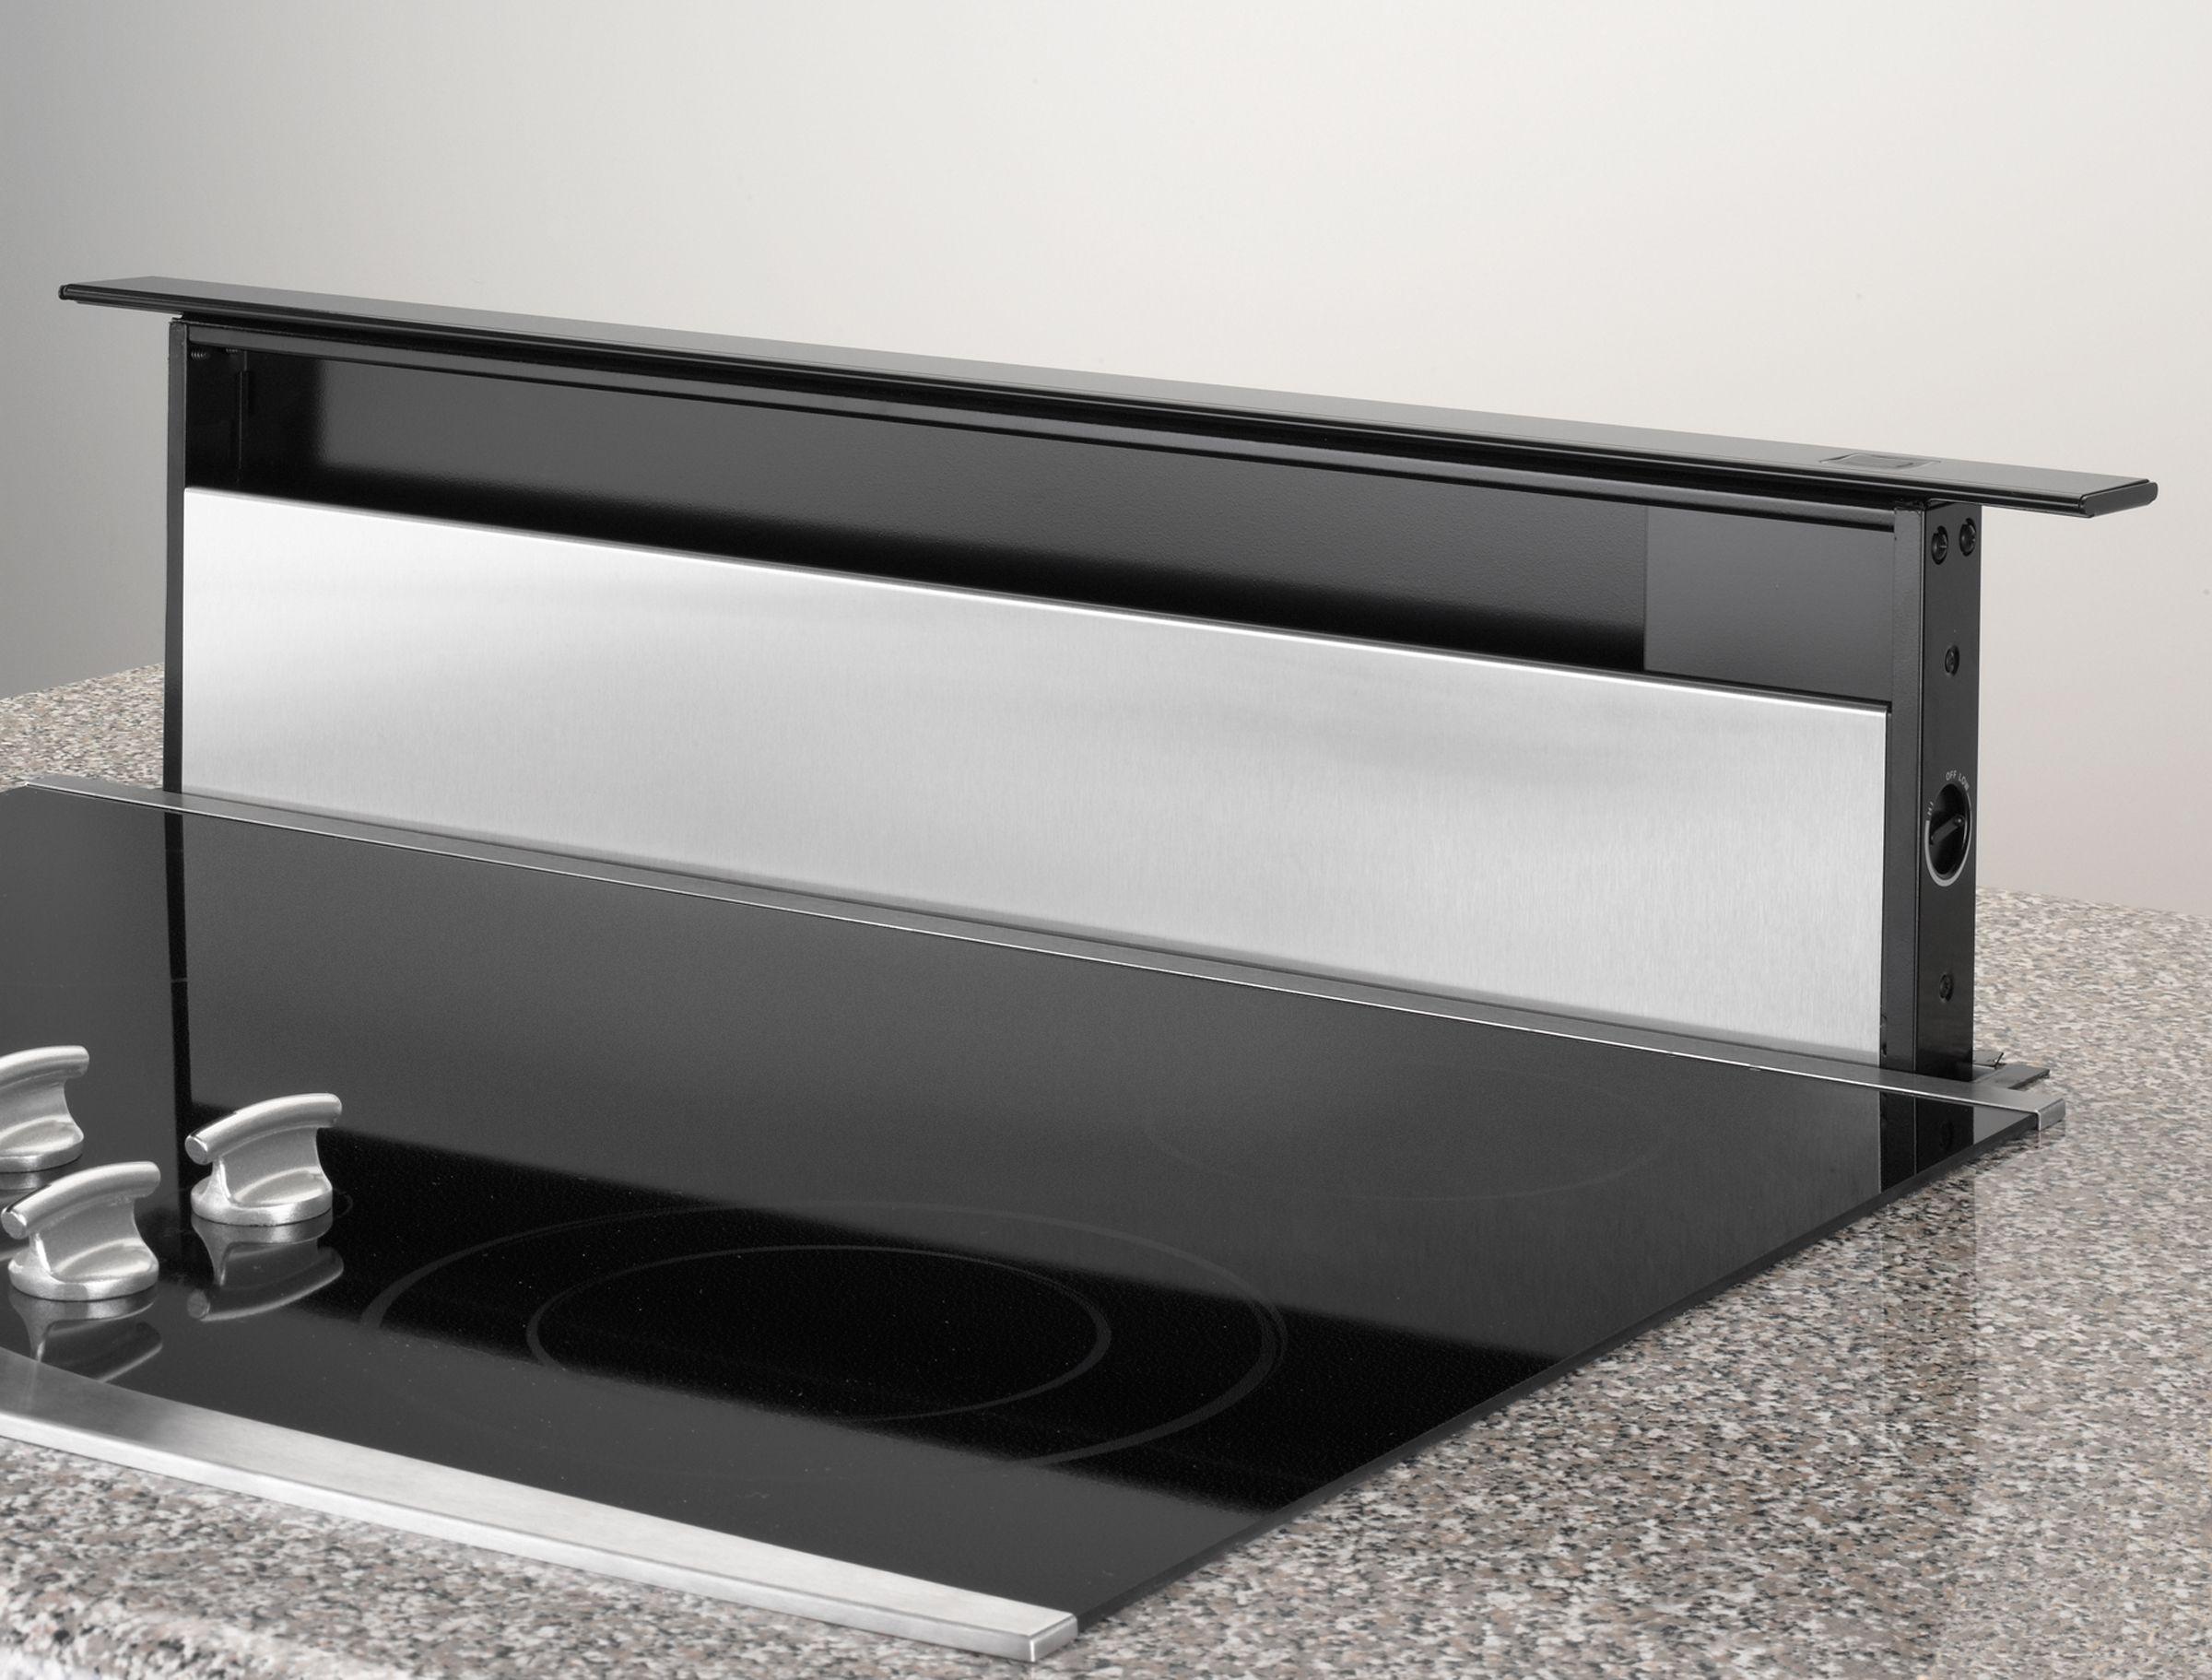 kitchen island ventilation hoods myideasbedroom com most powerful strongest downdraft ventilation reviews